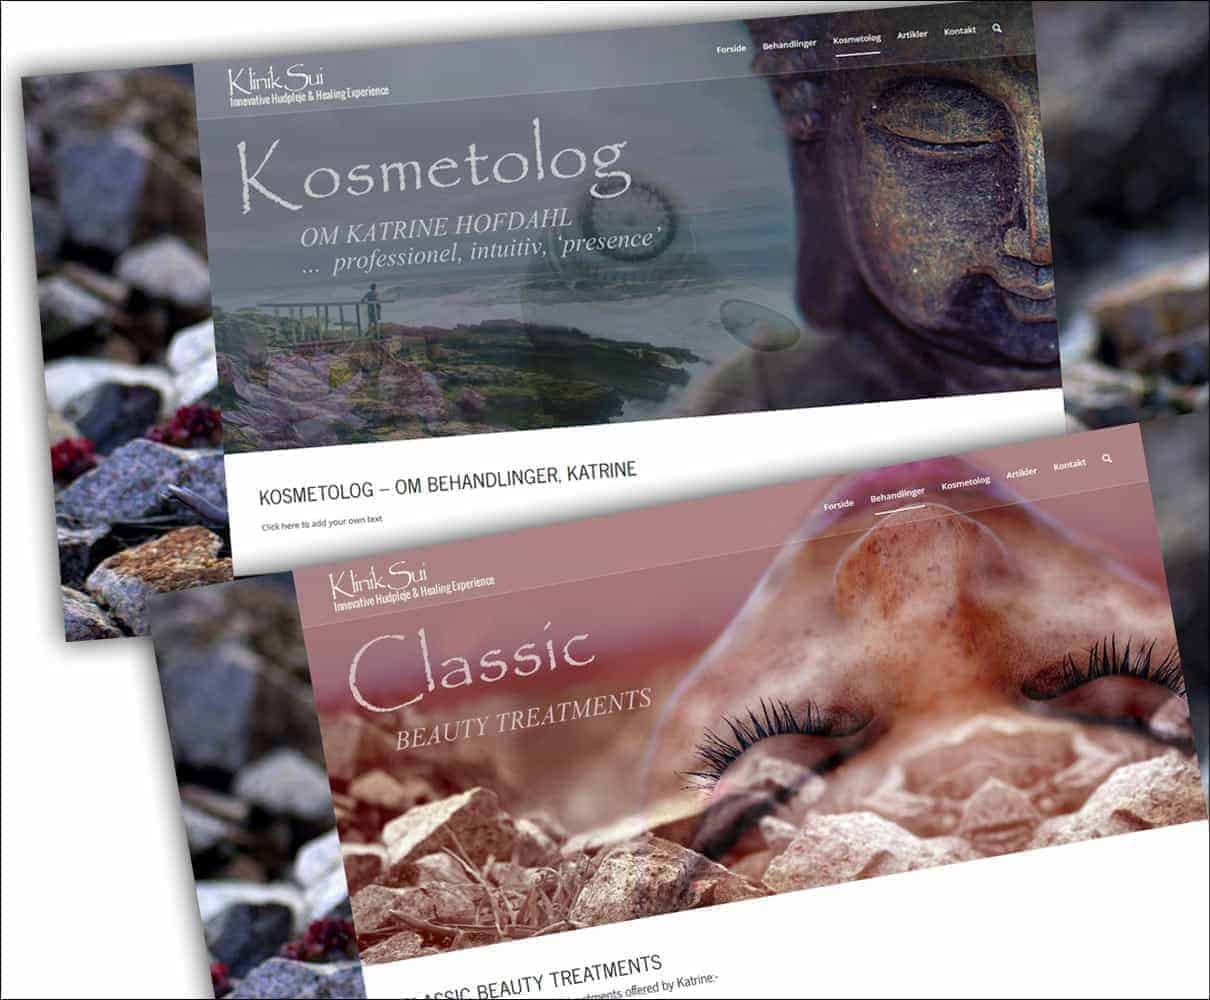 Klinik Sui kosmetolog, hudpleje - hjemmeside sider